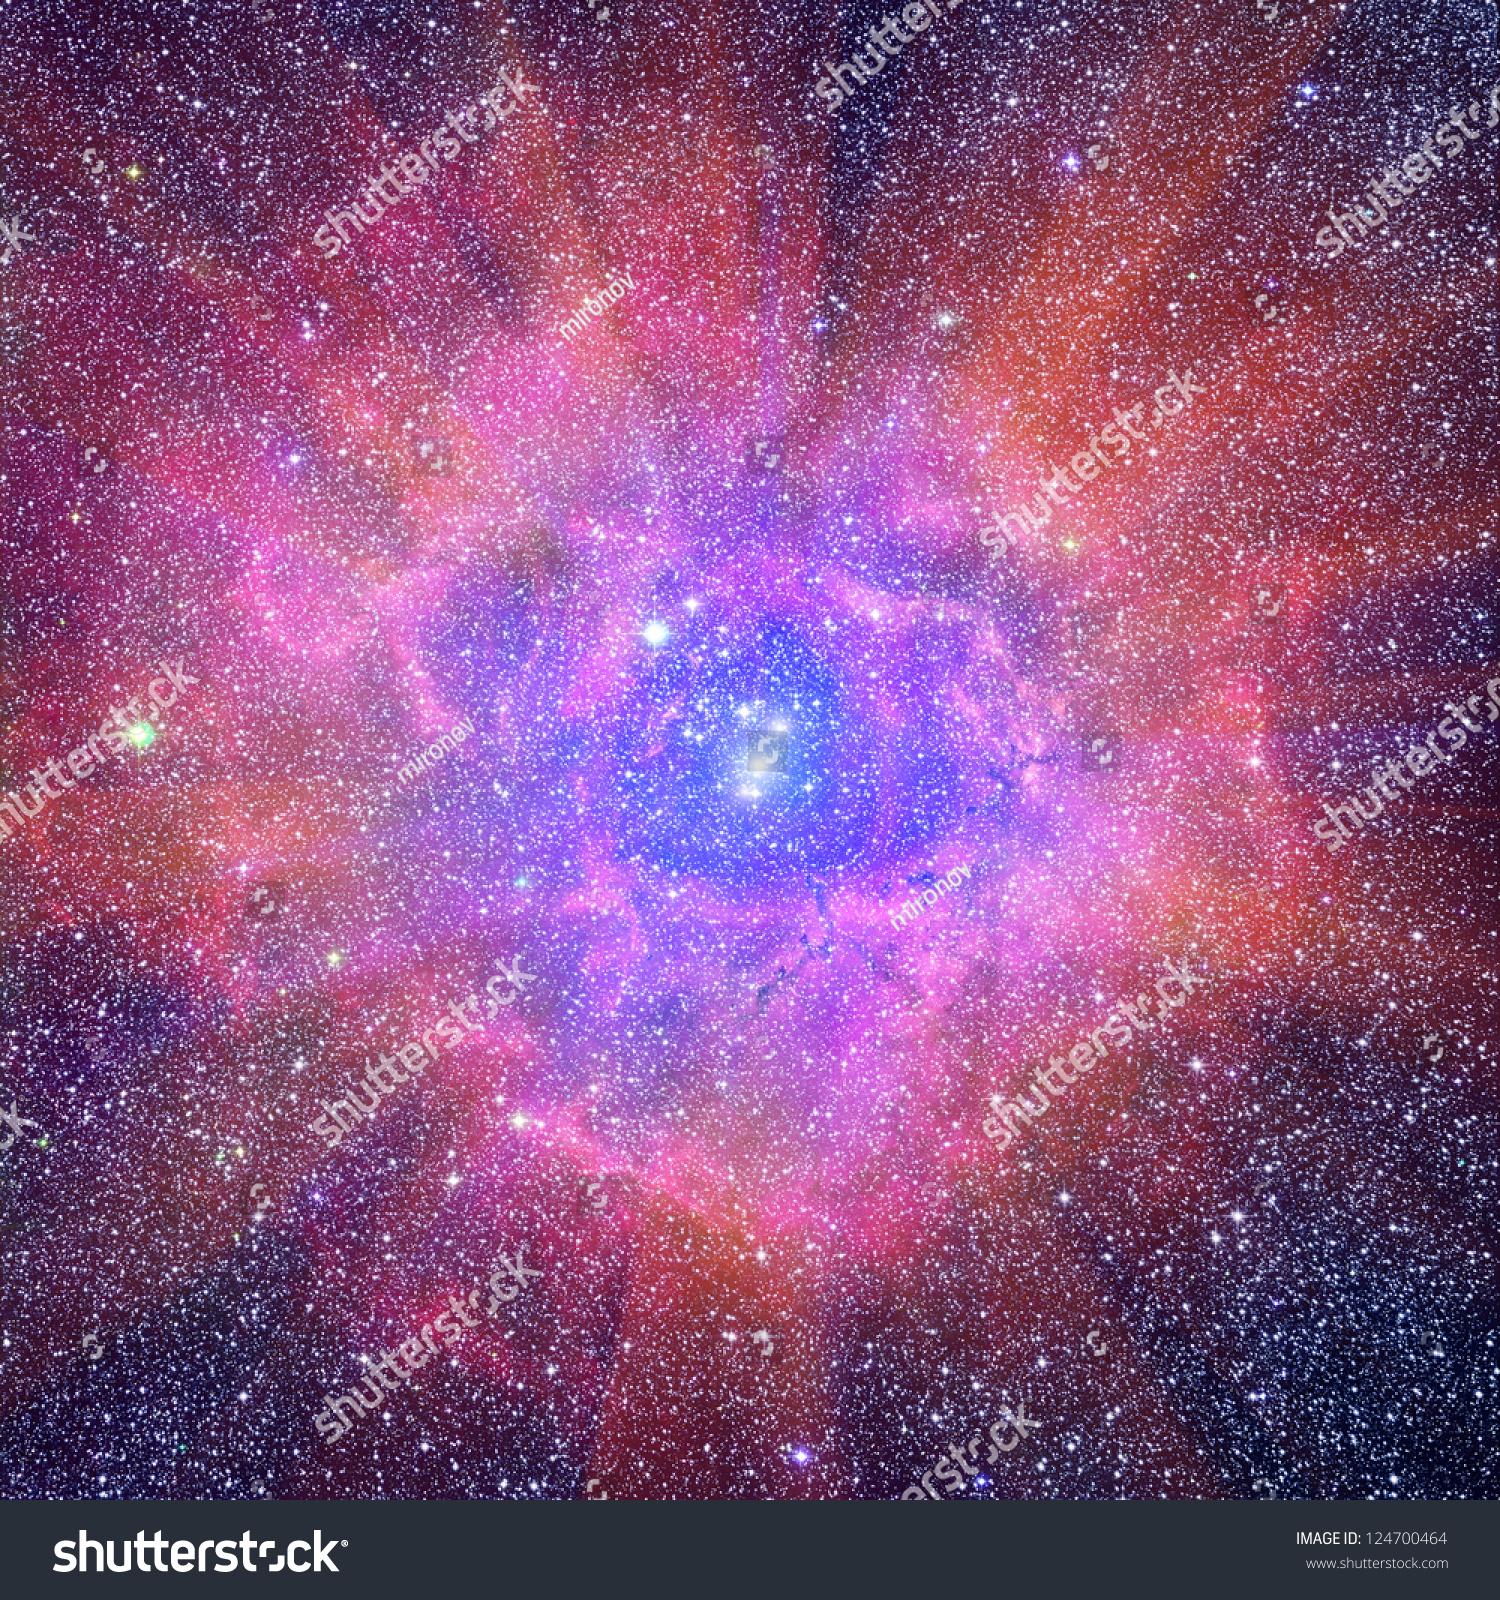 interstellar nebula - photo #25